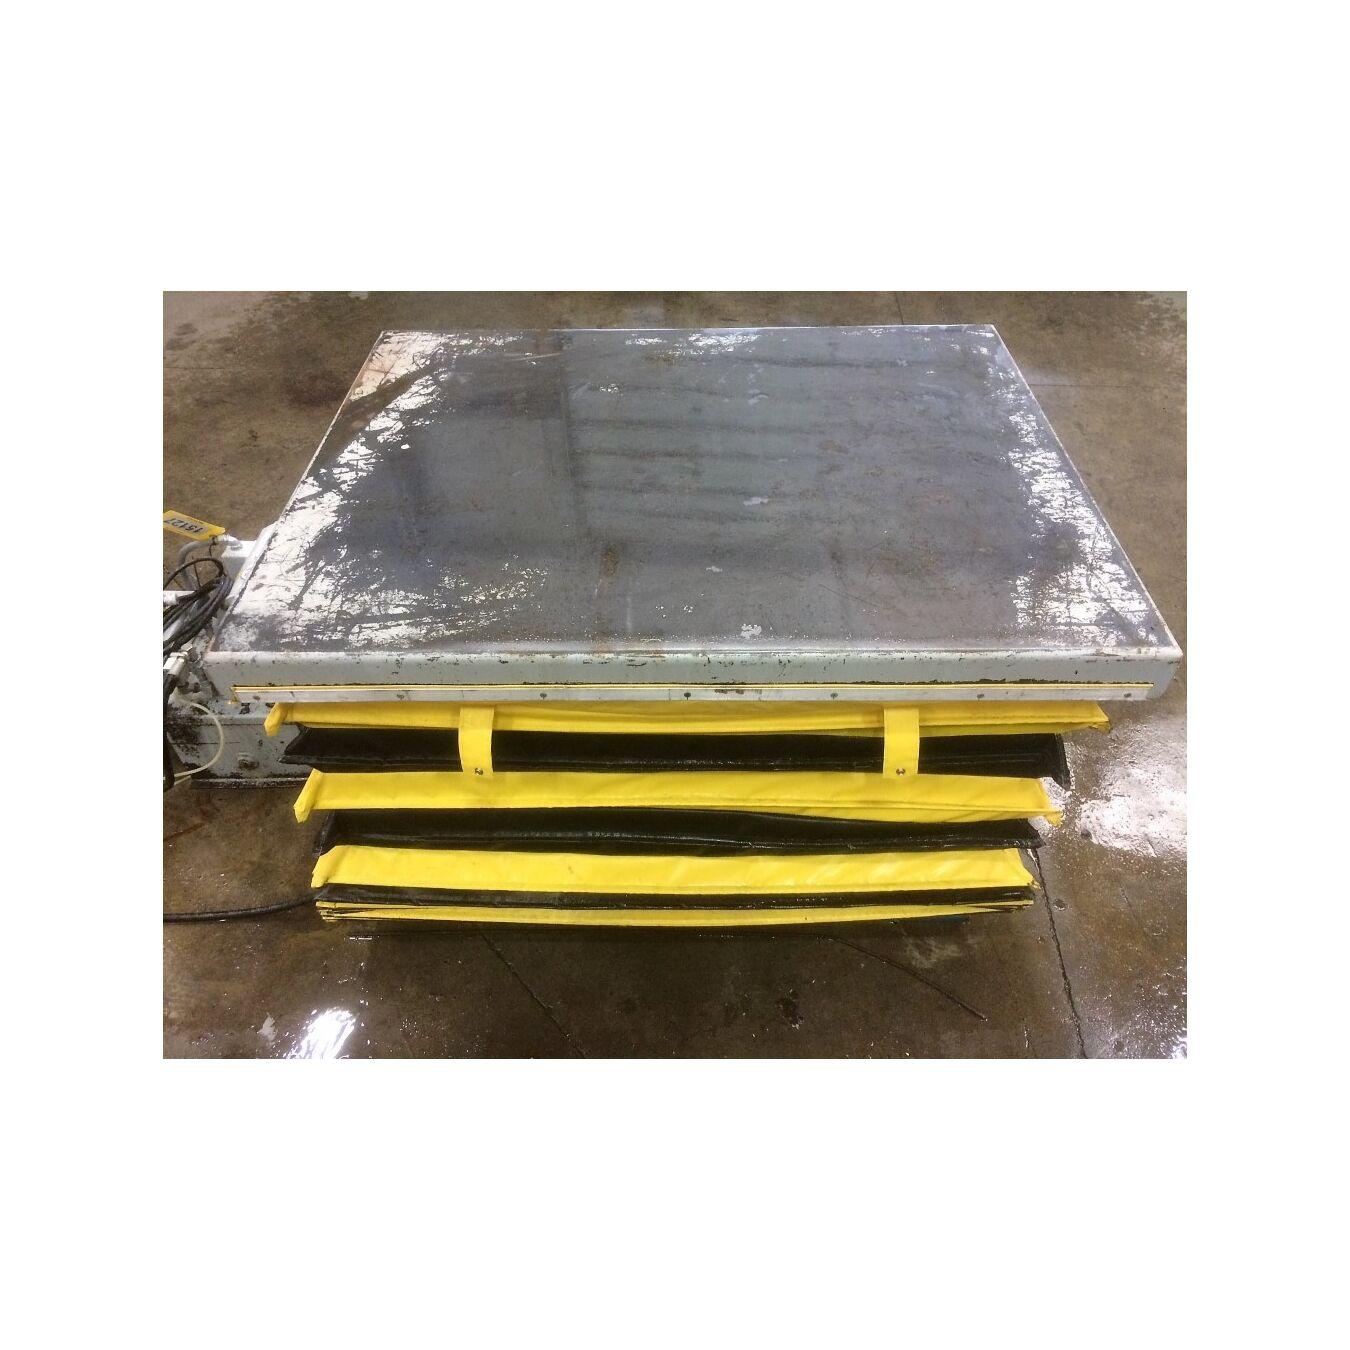 Used 4000 lb capacity american scissor lift table model m 1170 2j used 4000 lb capacity american scissor lift table model m 1170 2j geotapseo Choice Image